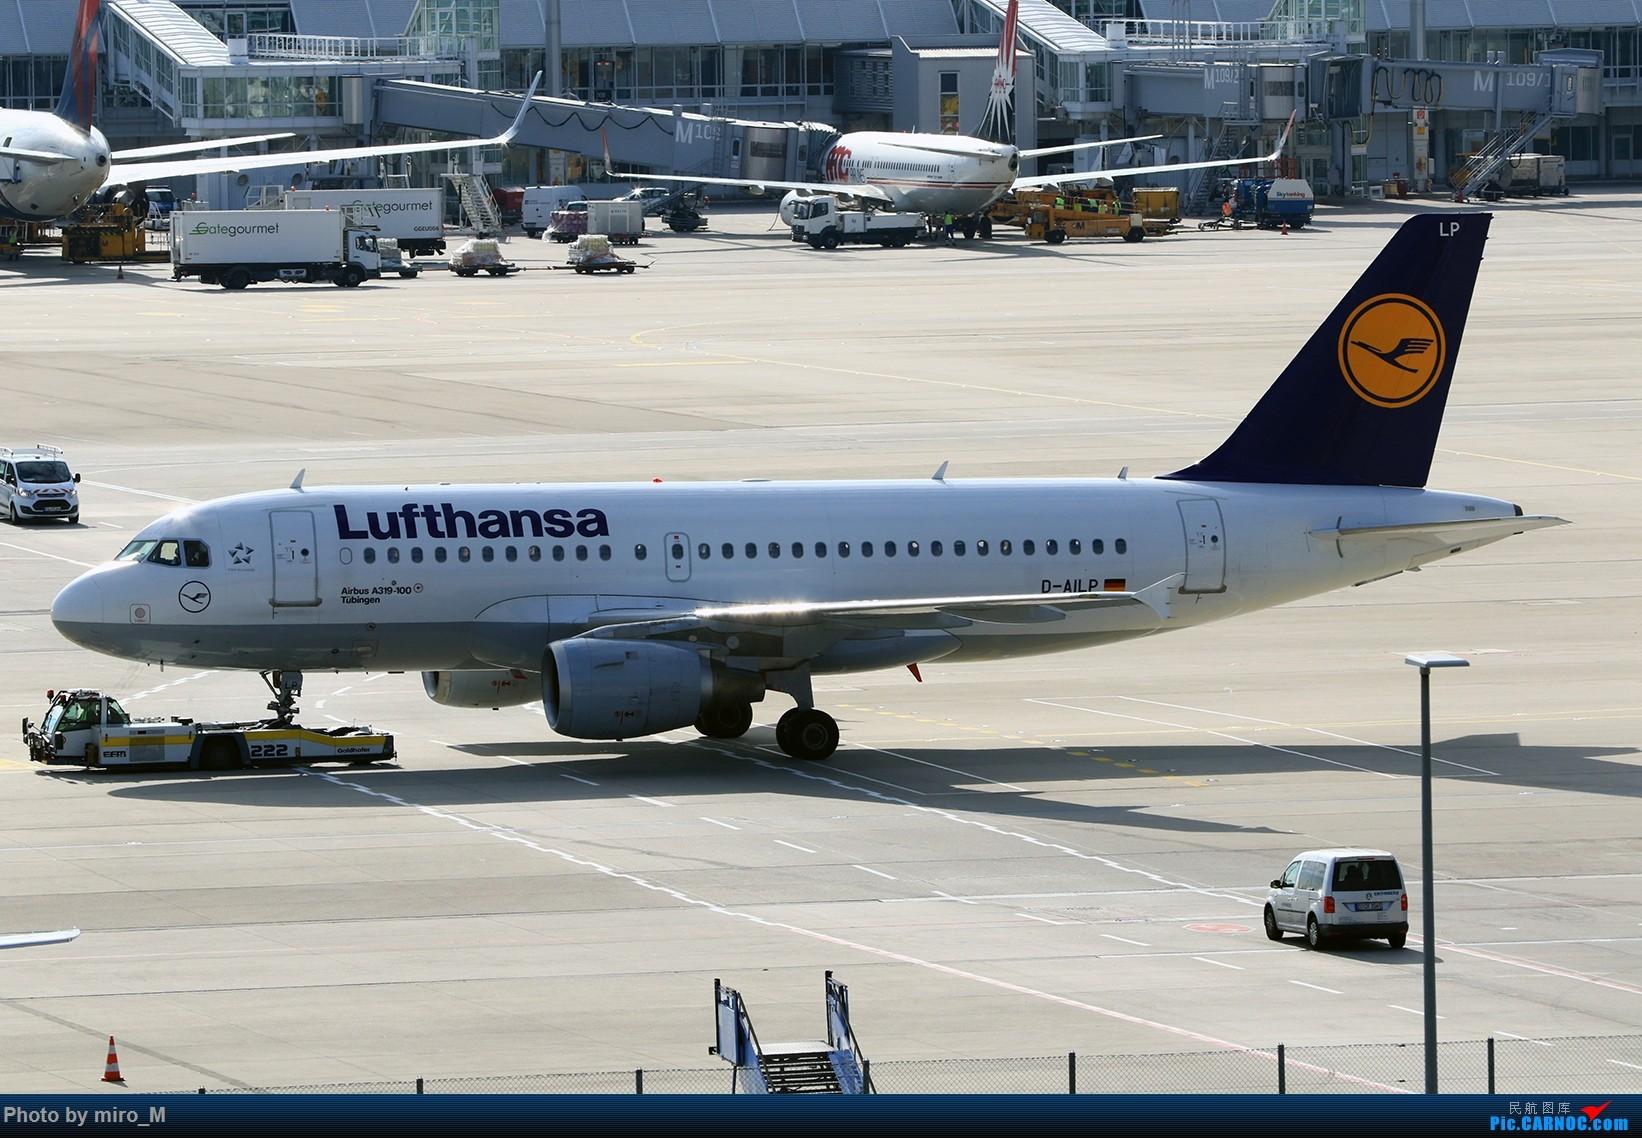 Re:[原创]欧洲浪了一圈,CS100,BAE146,fokker70等新老机型串着飞+ZRH,MUC,FRA,AMS,TLS拍机 AIRBUS A319-100 D-AILP MUC